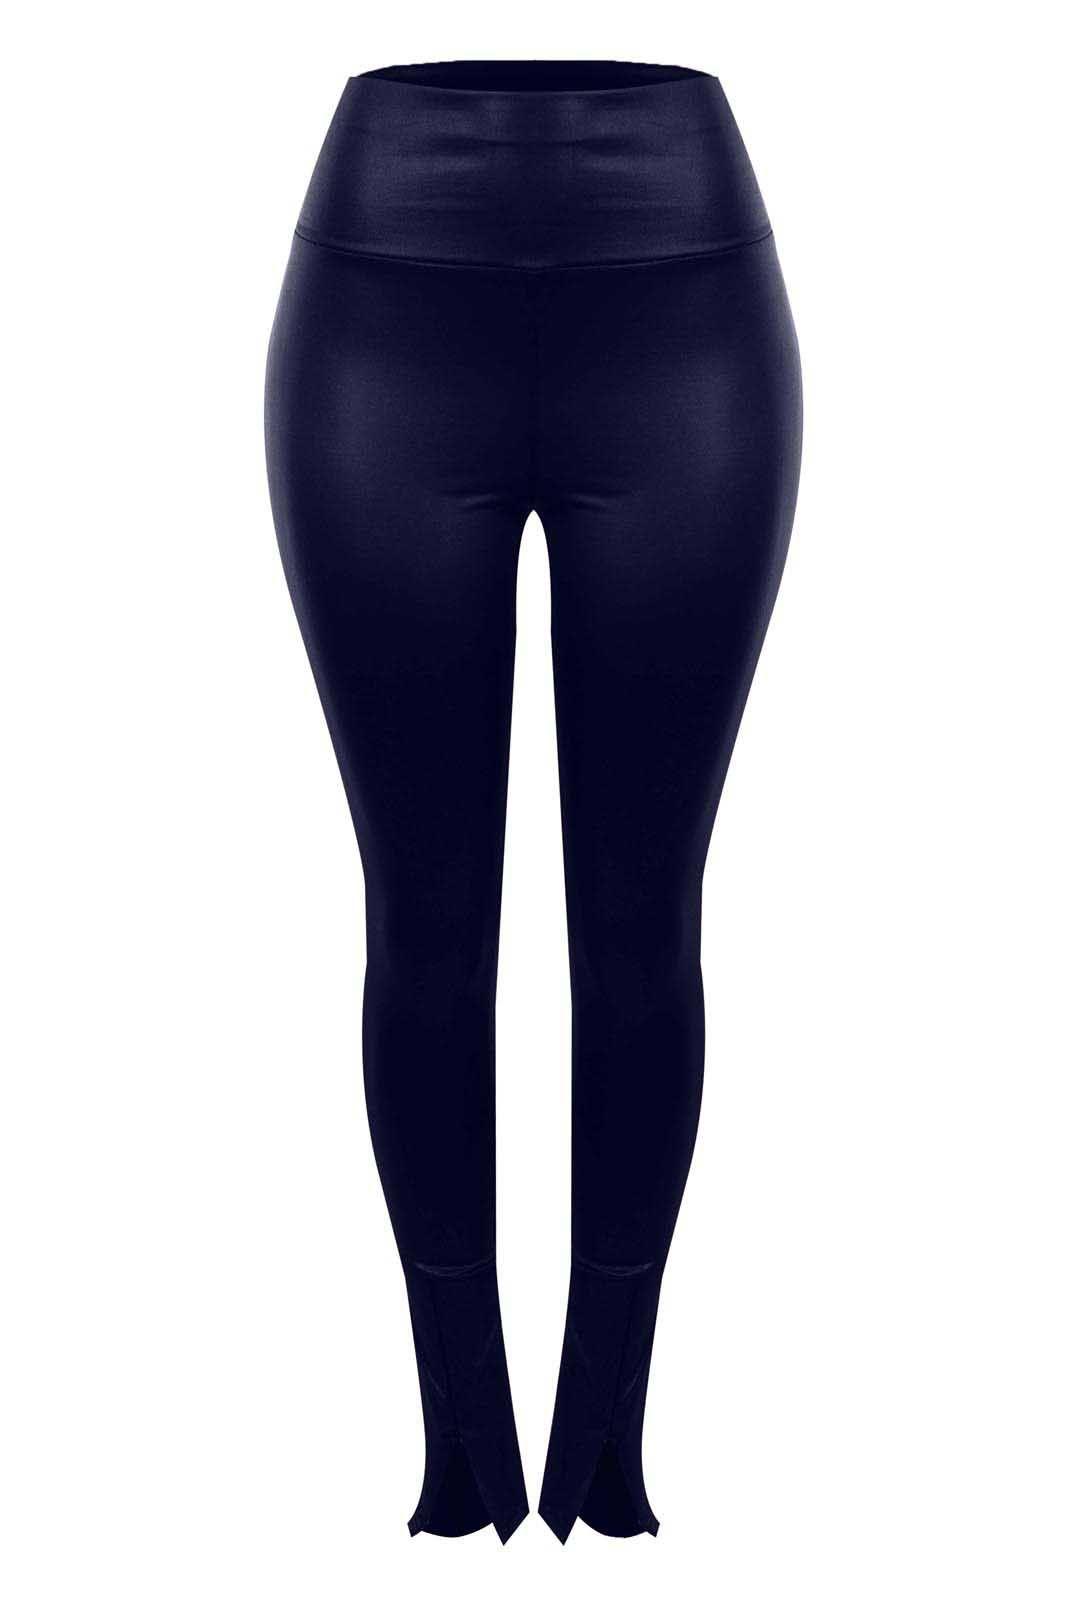 Legging Outlet Dri Cirrê Detalhe Zíper Frontal Hot Pants Índigo